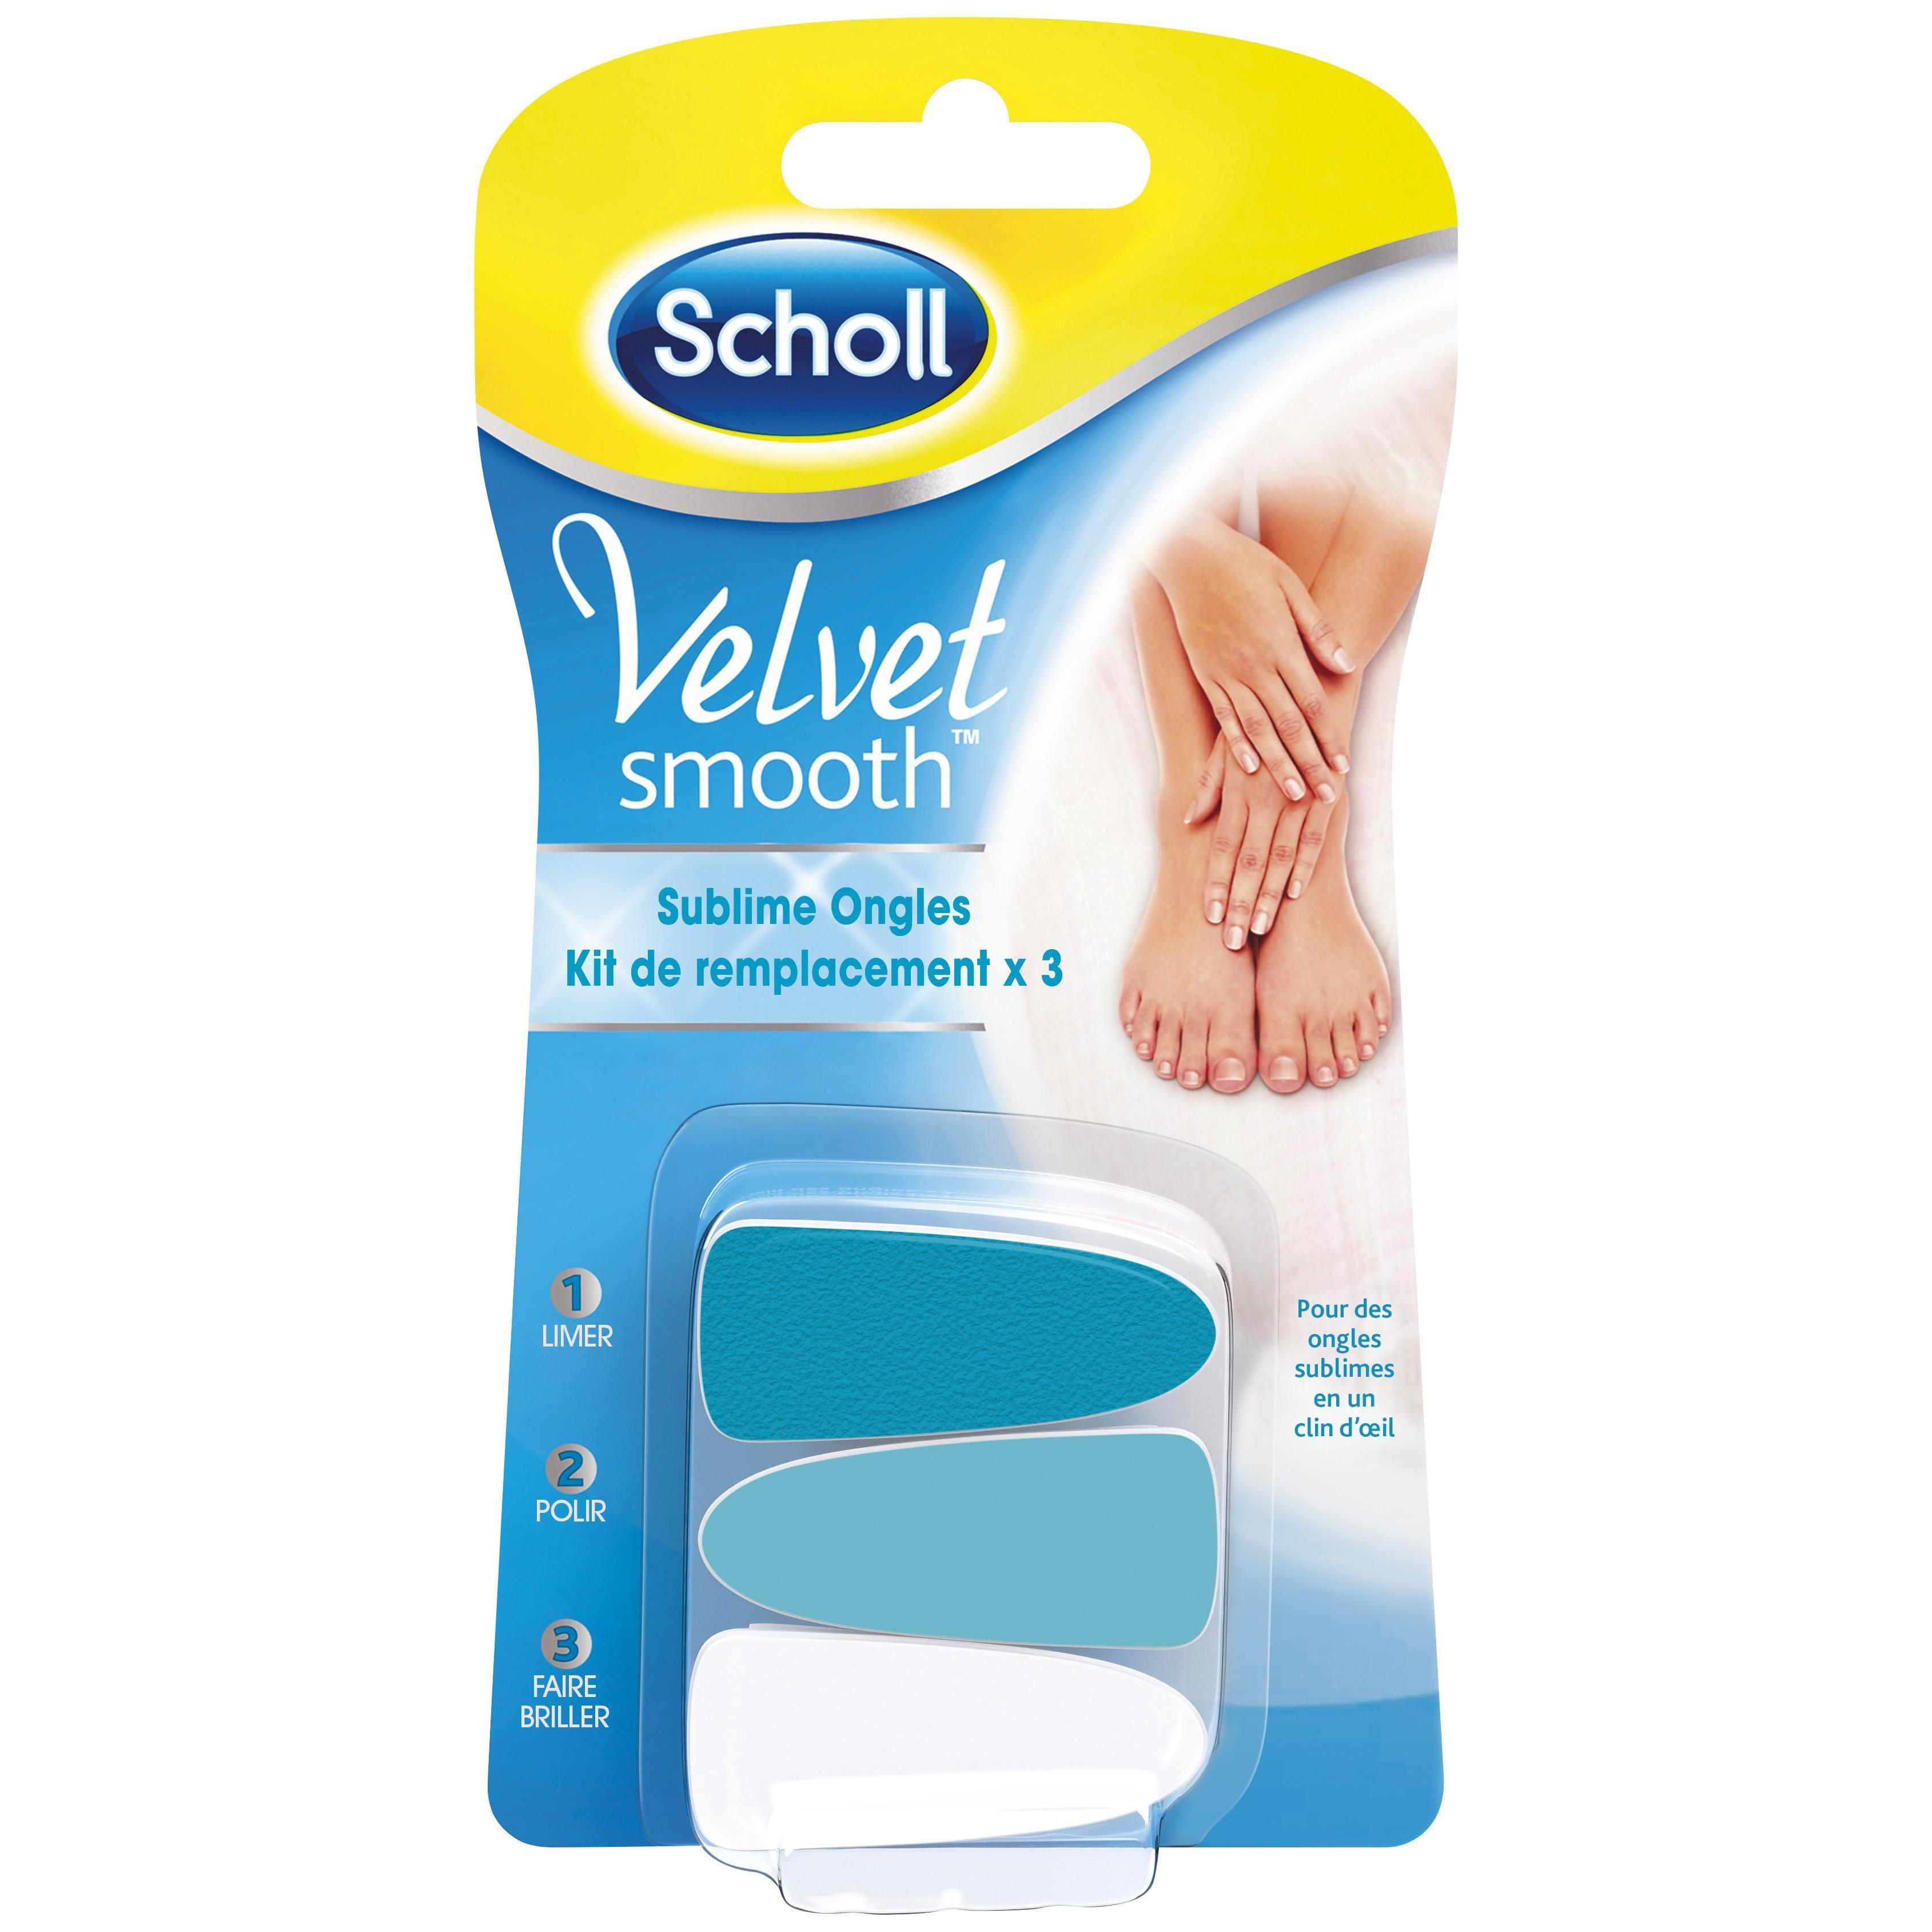 Scholl Velvet Smooth elektrische nagelvijl refills